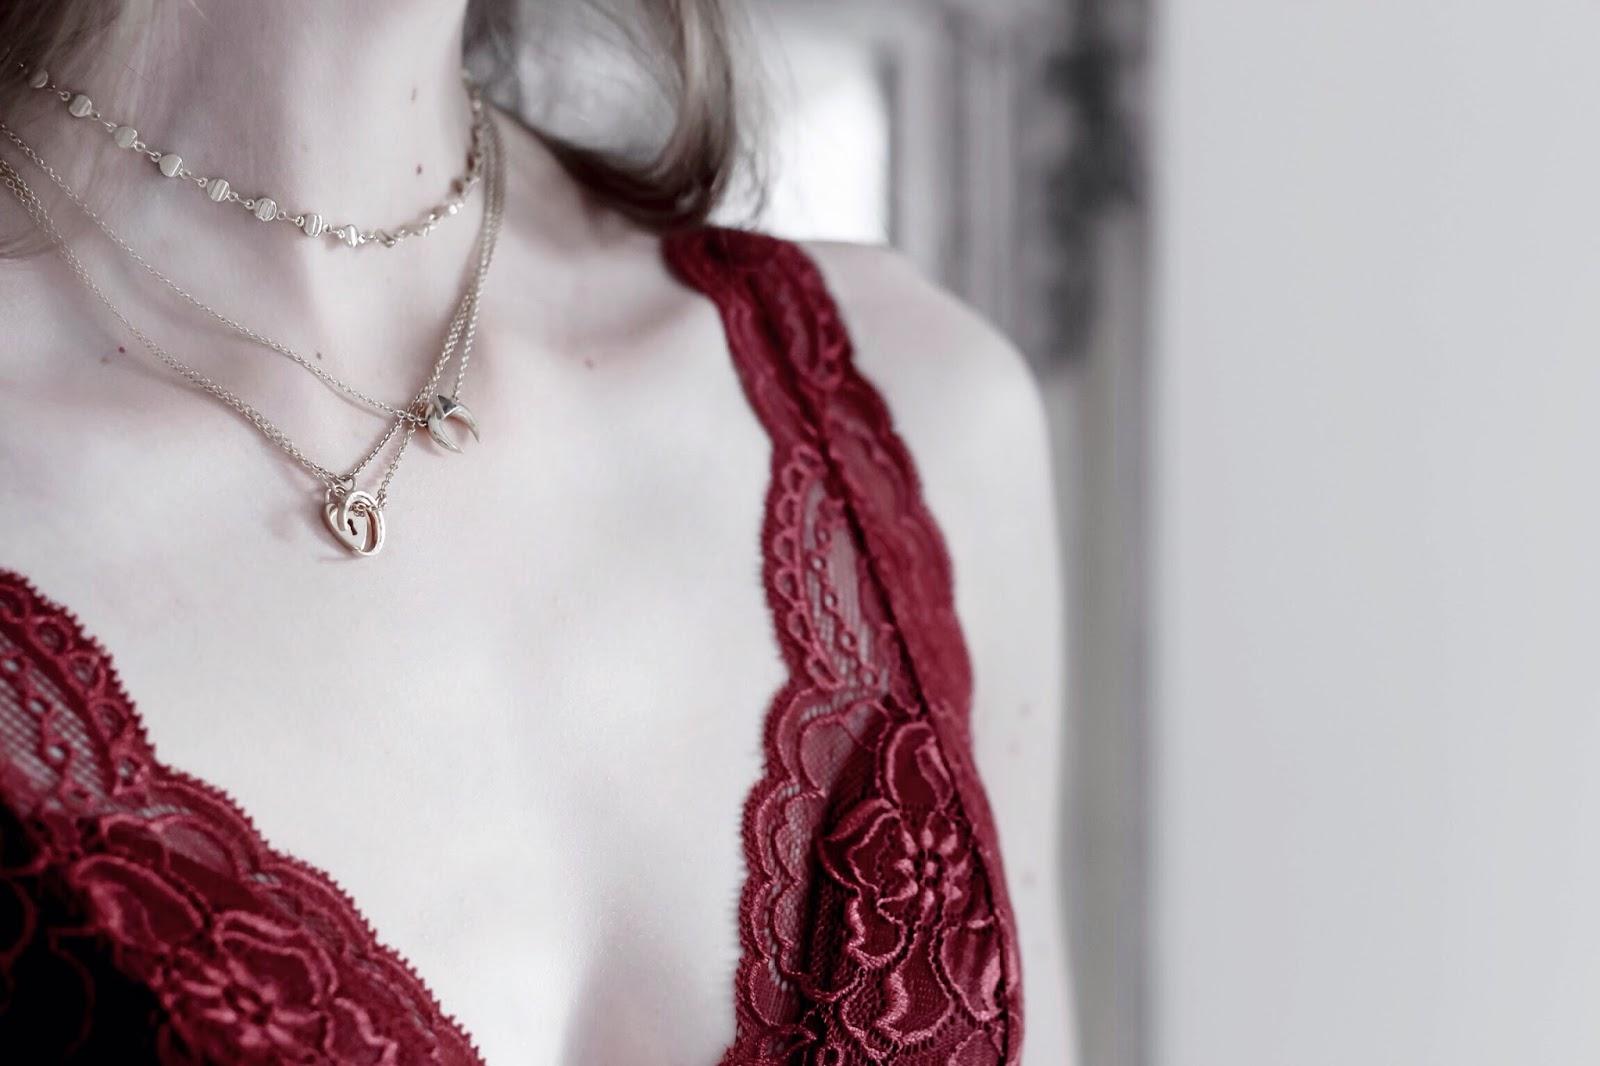 Many gold layered necklaces fashion blogger